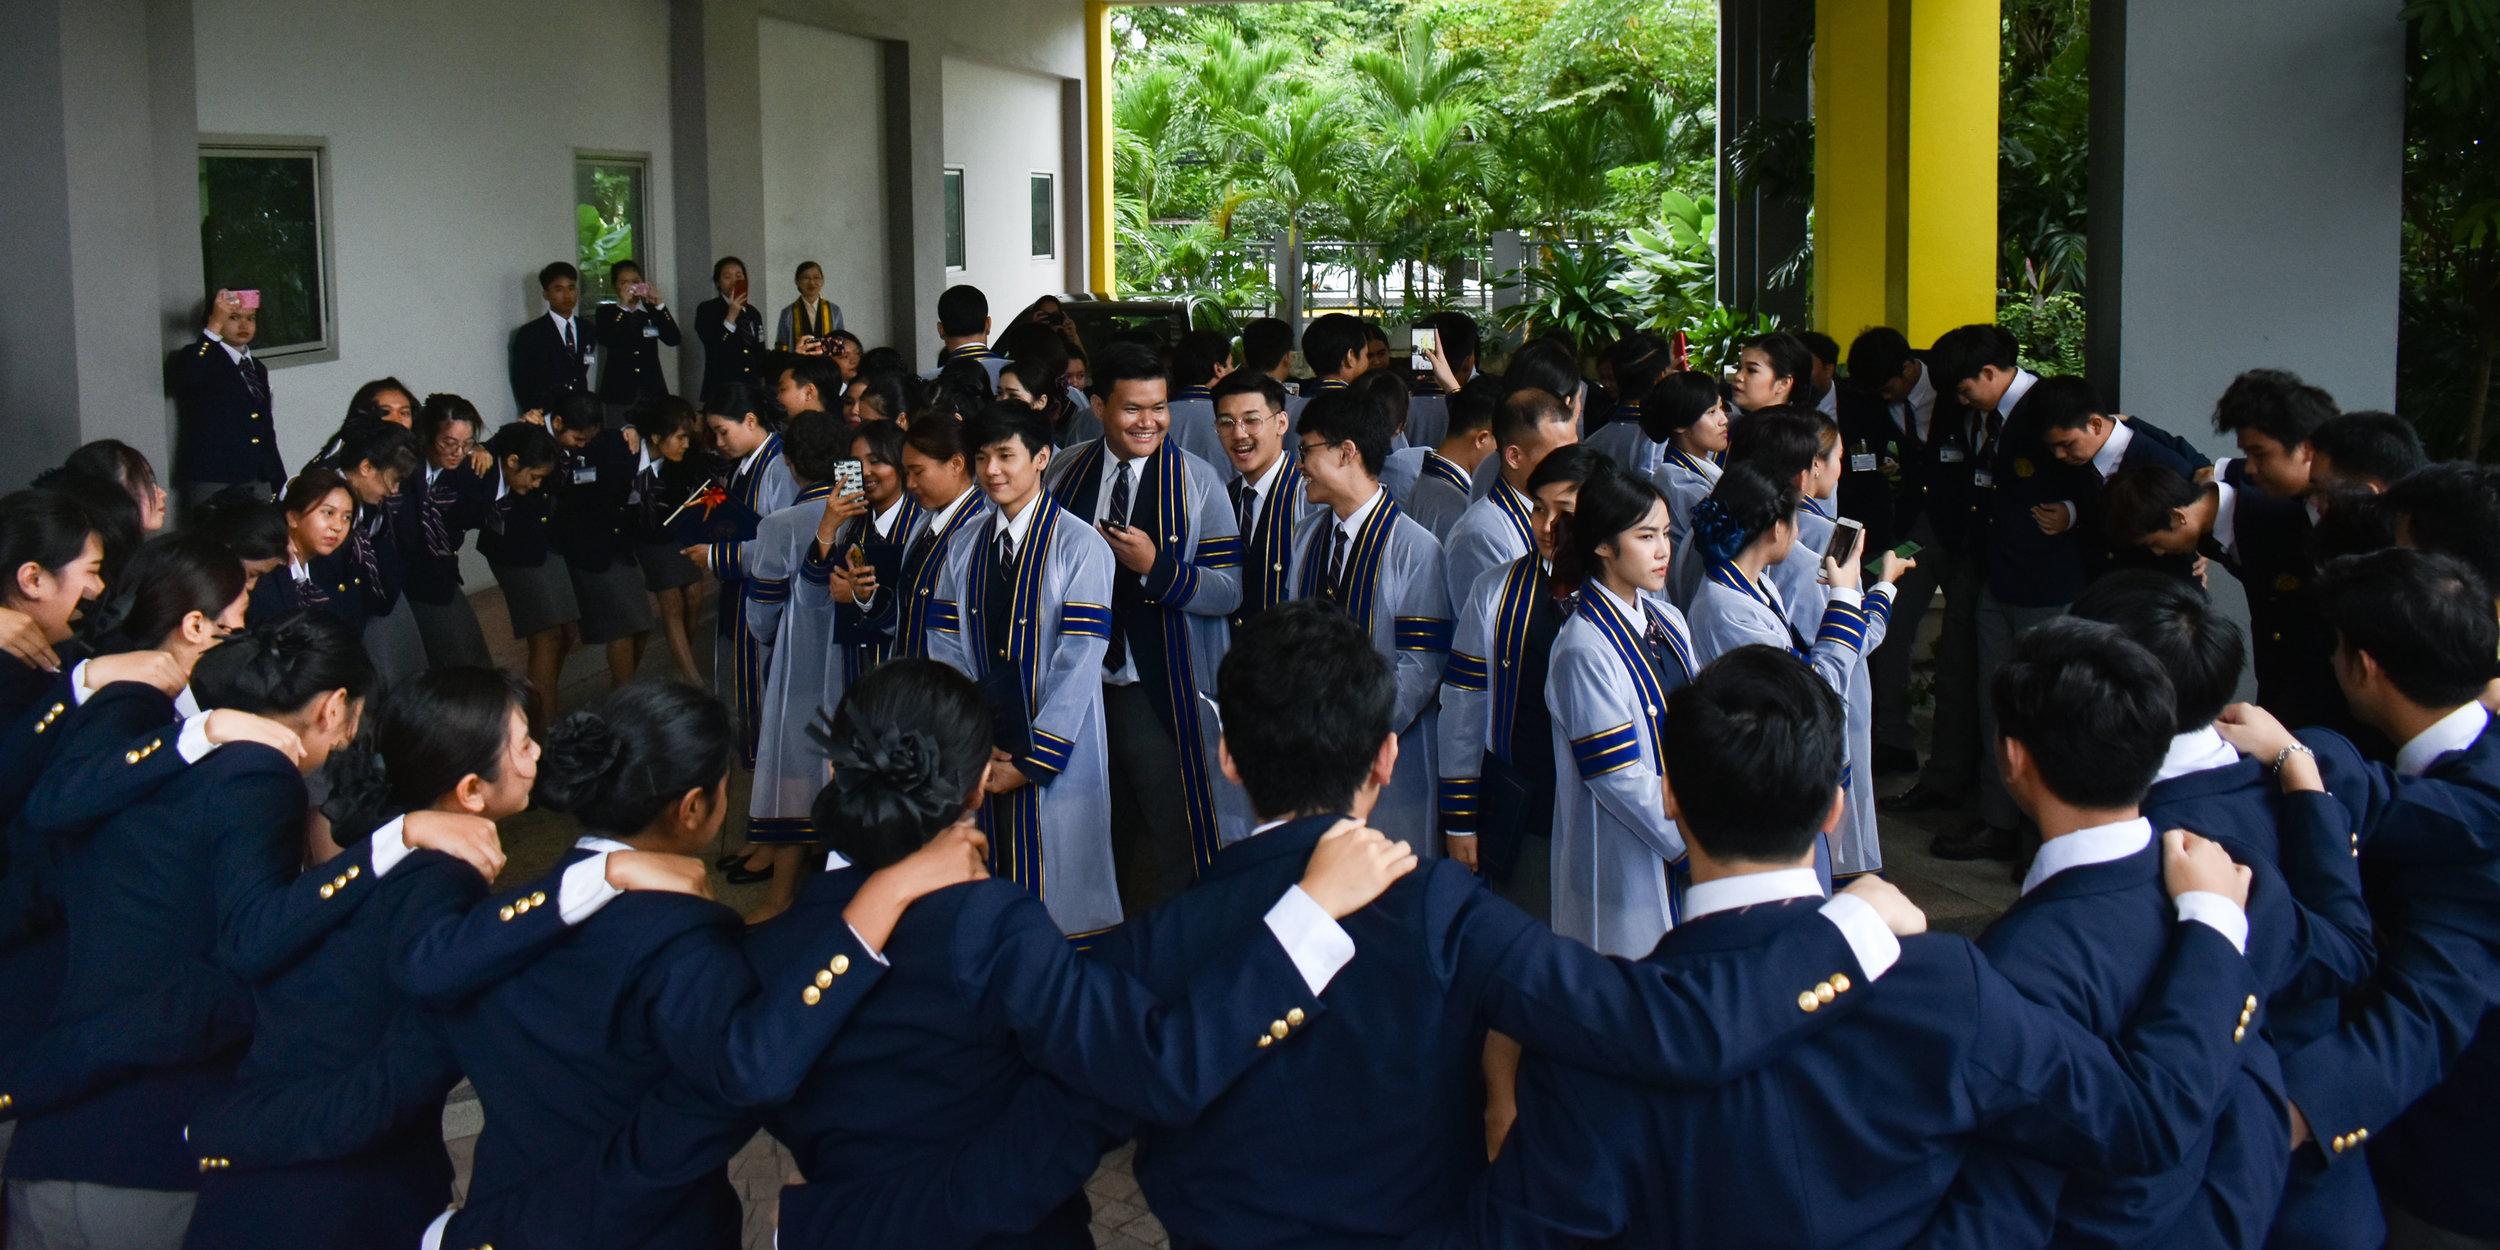 graduation 2018 (52 of 61).jpg